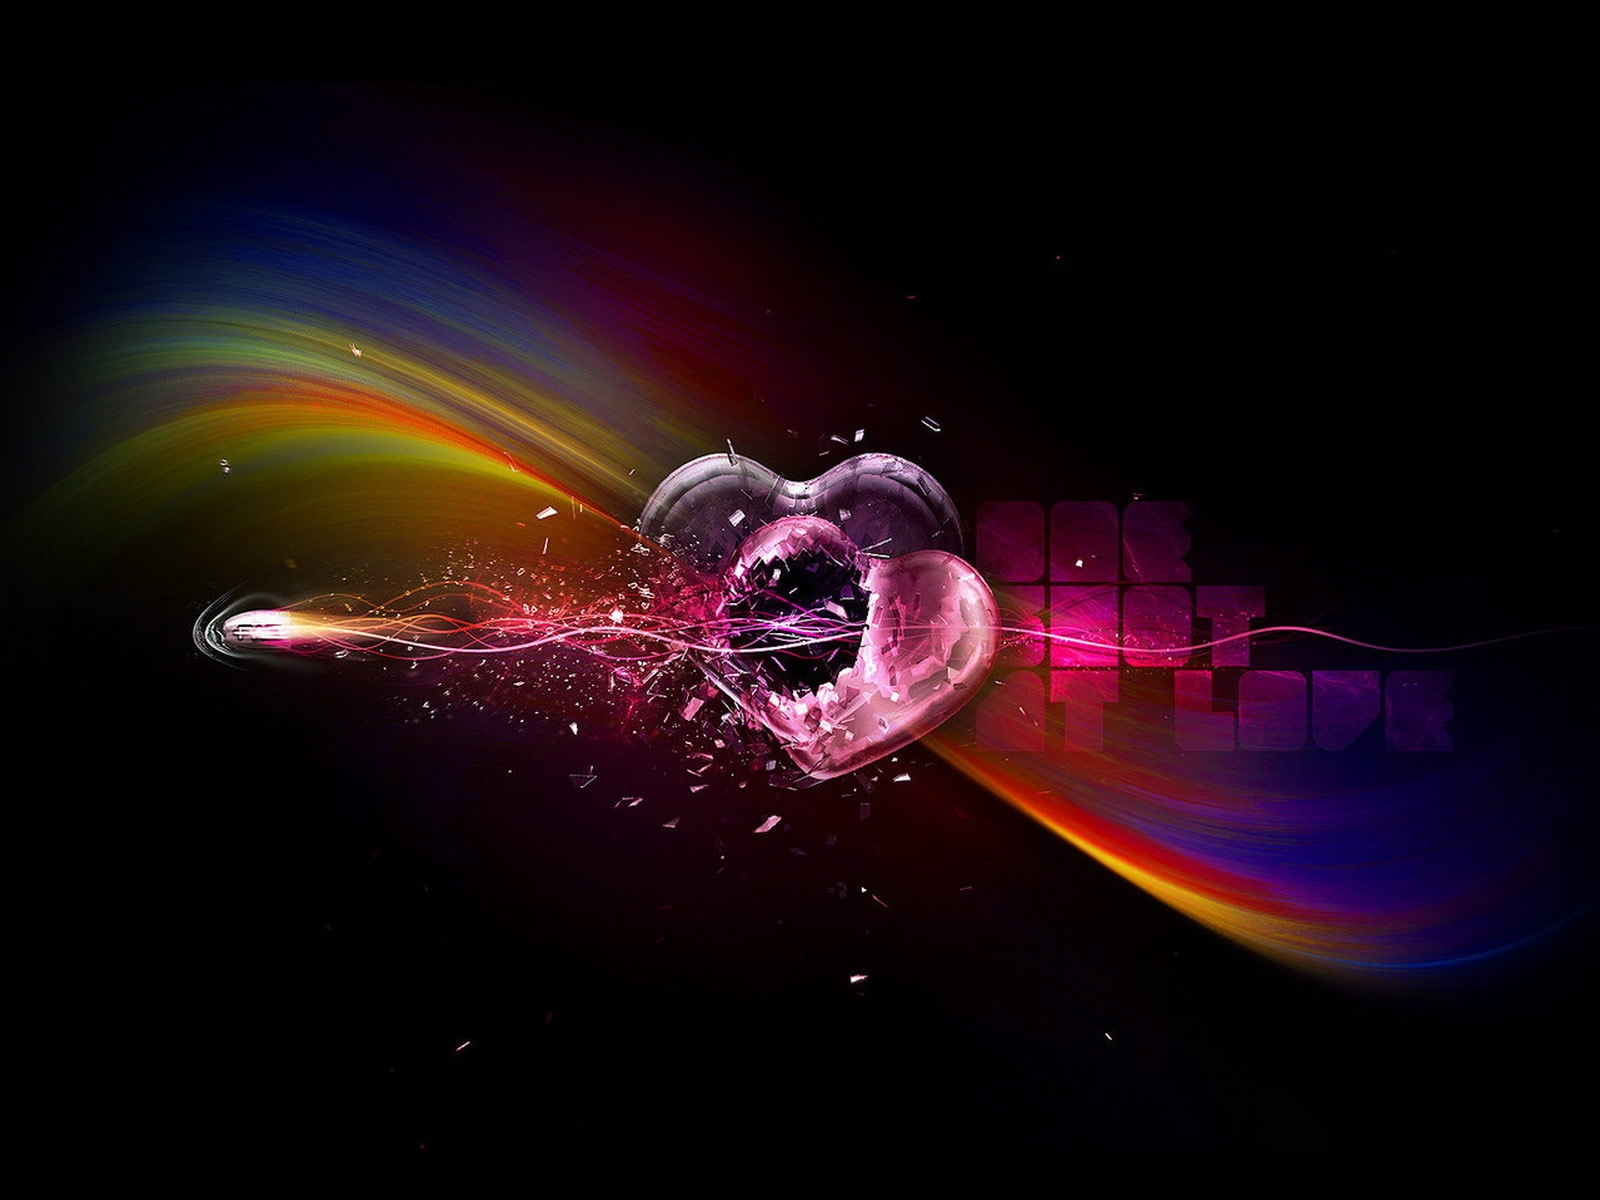 Un disparo al amor